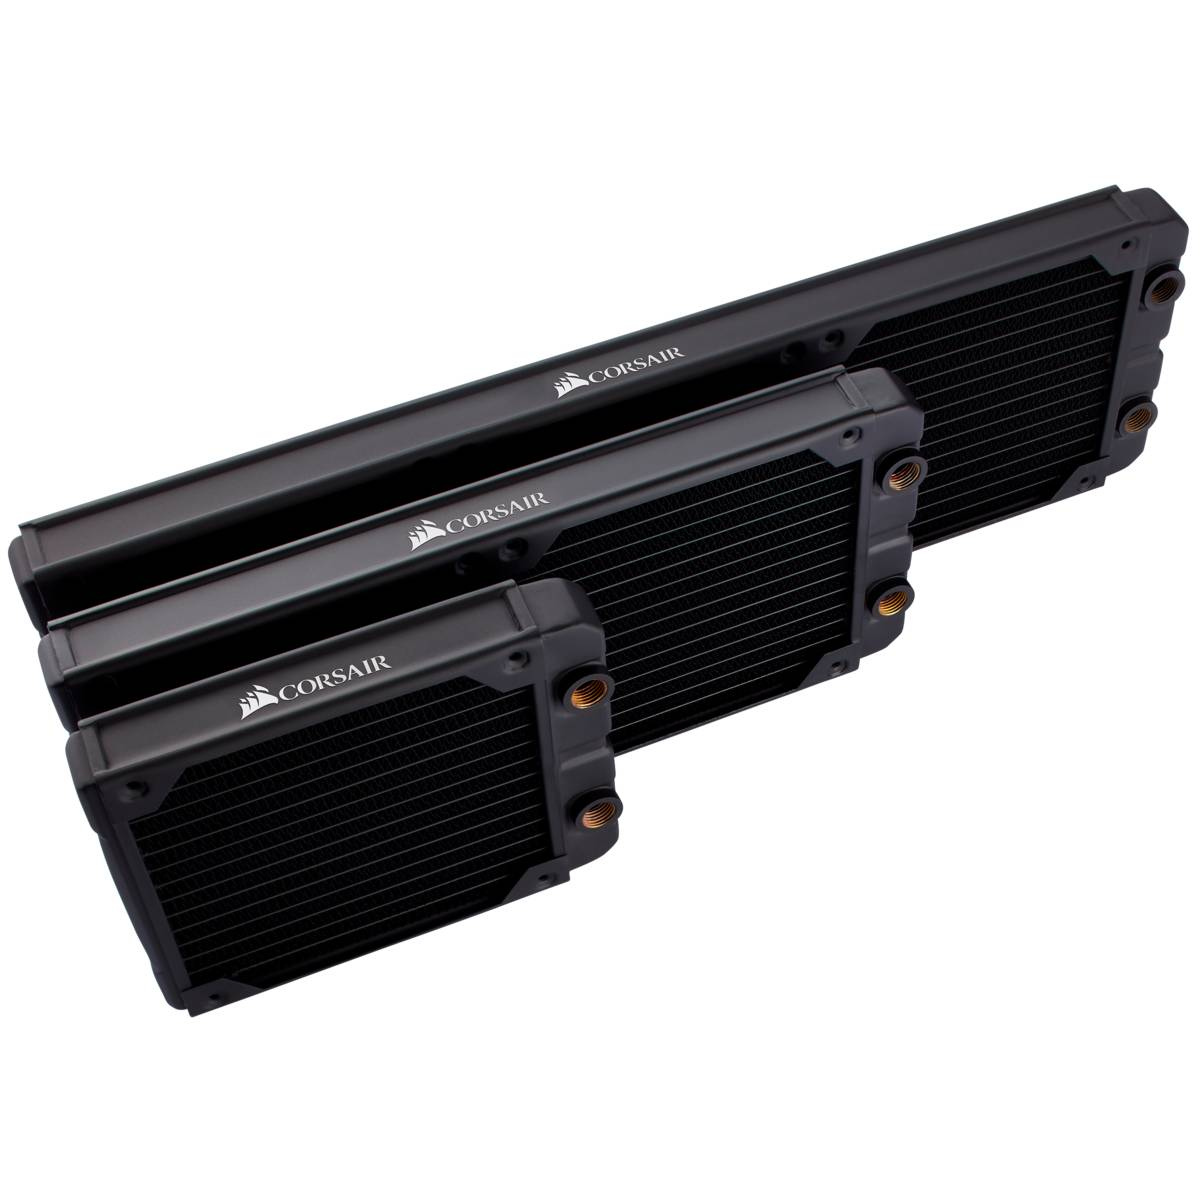 CORSAIR Hydro X Series XR5 140mm Water Cooling Radiator